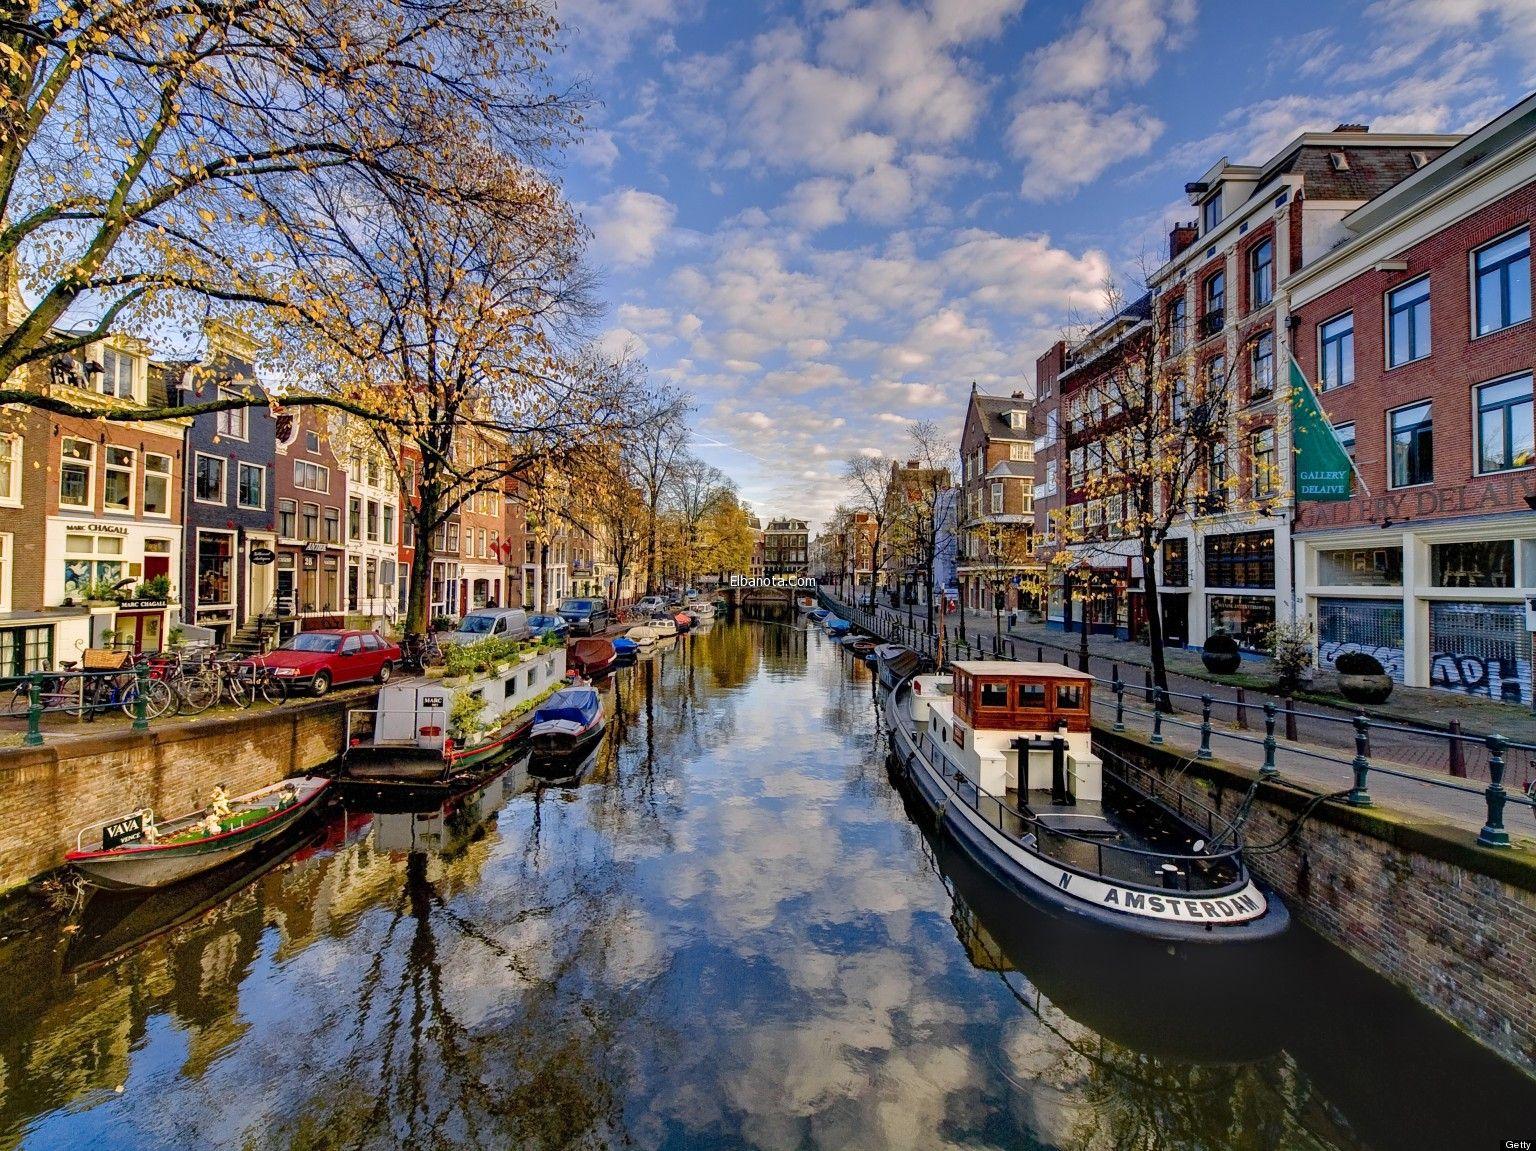 طريقة عمل جزر الكرفس بالبرتقال Amsterdam Travel Places To Travel Places To Go